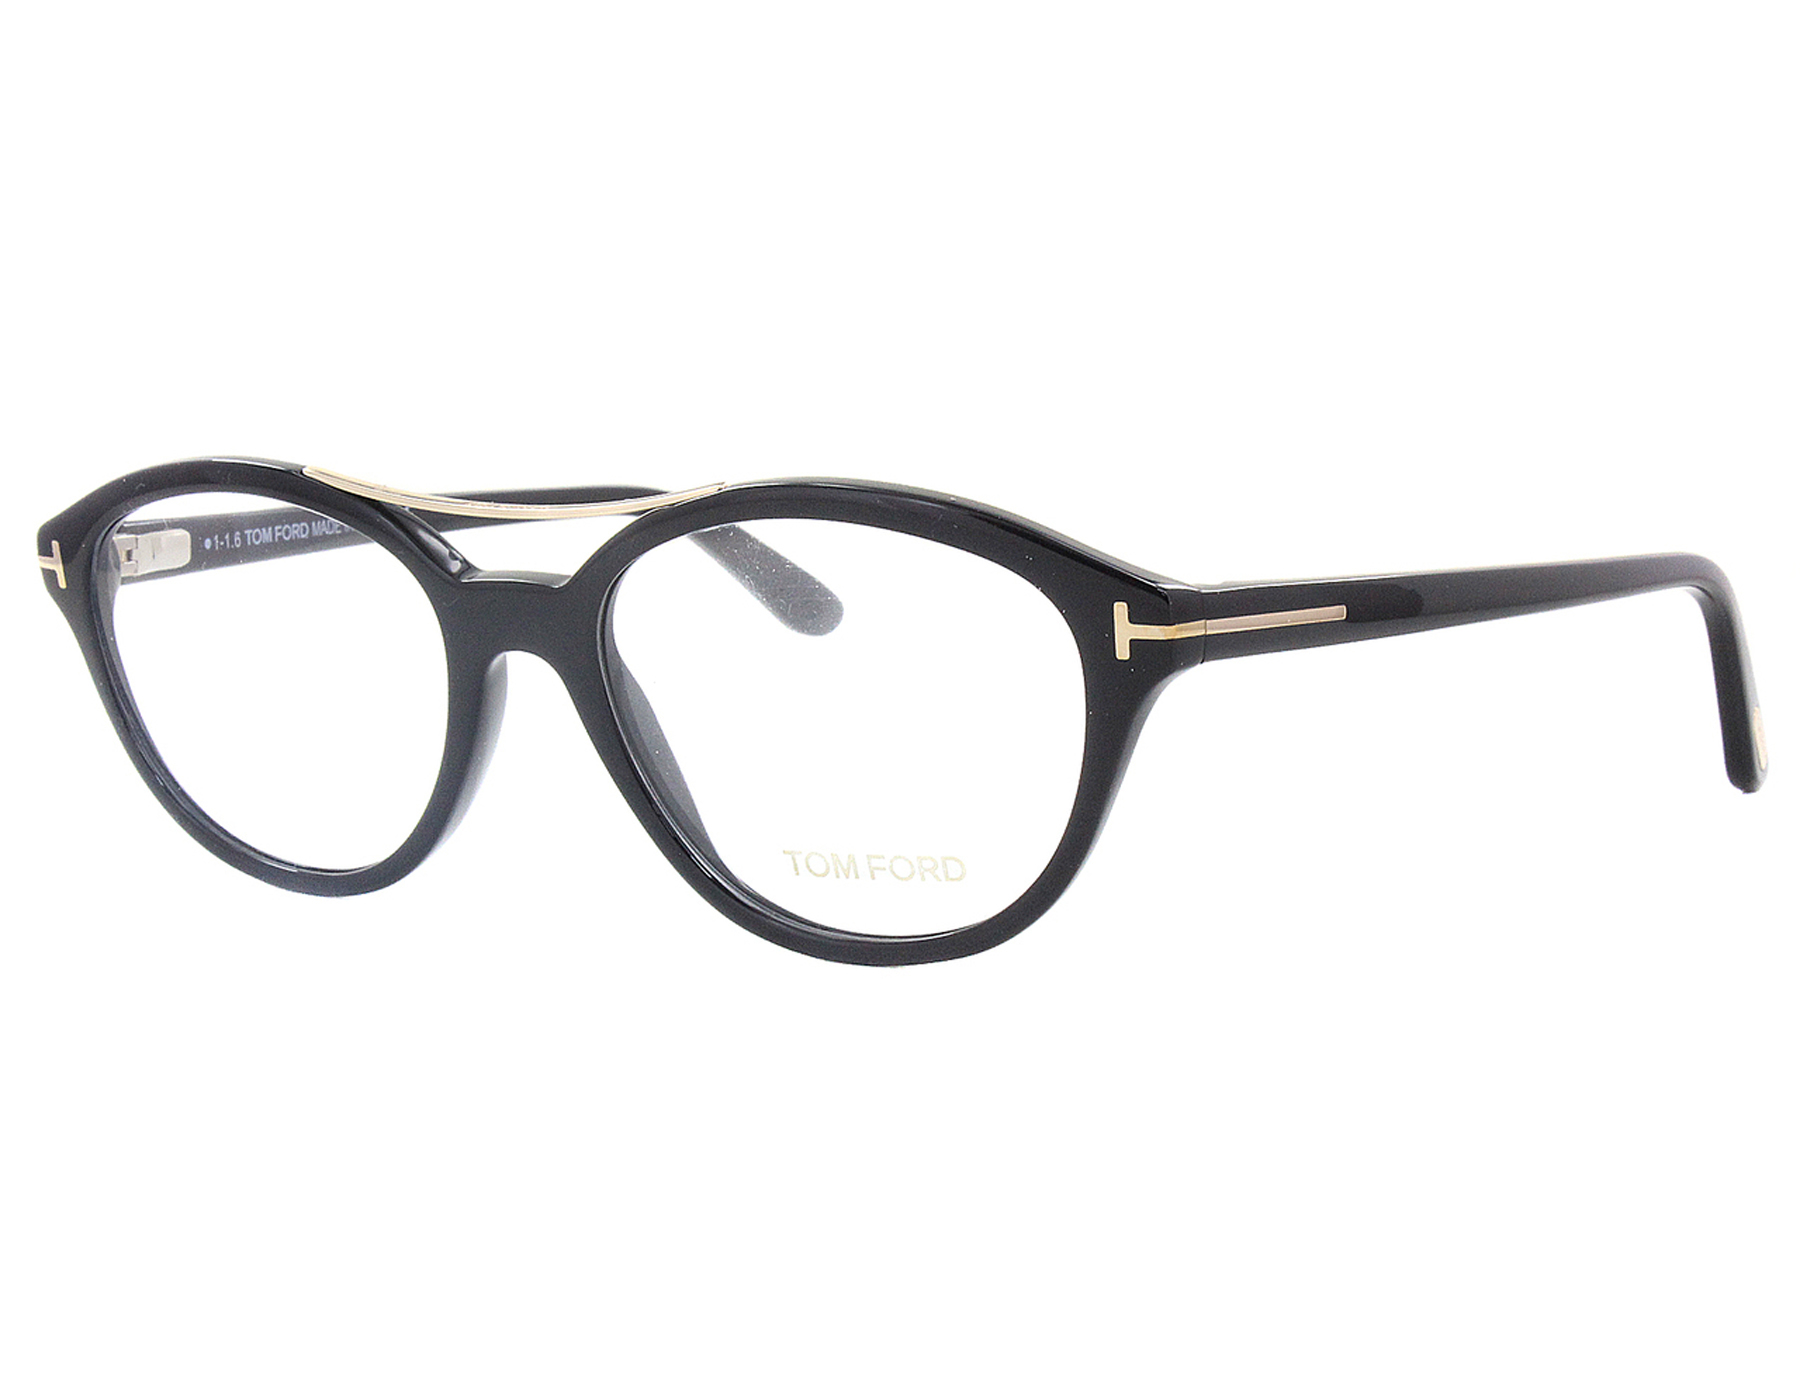 33144aa362 Details about NEW Tom Ford FT5412 001 52mm Black Optical Eyeglasses Frames